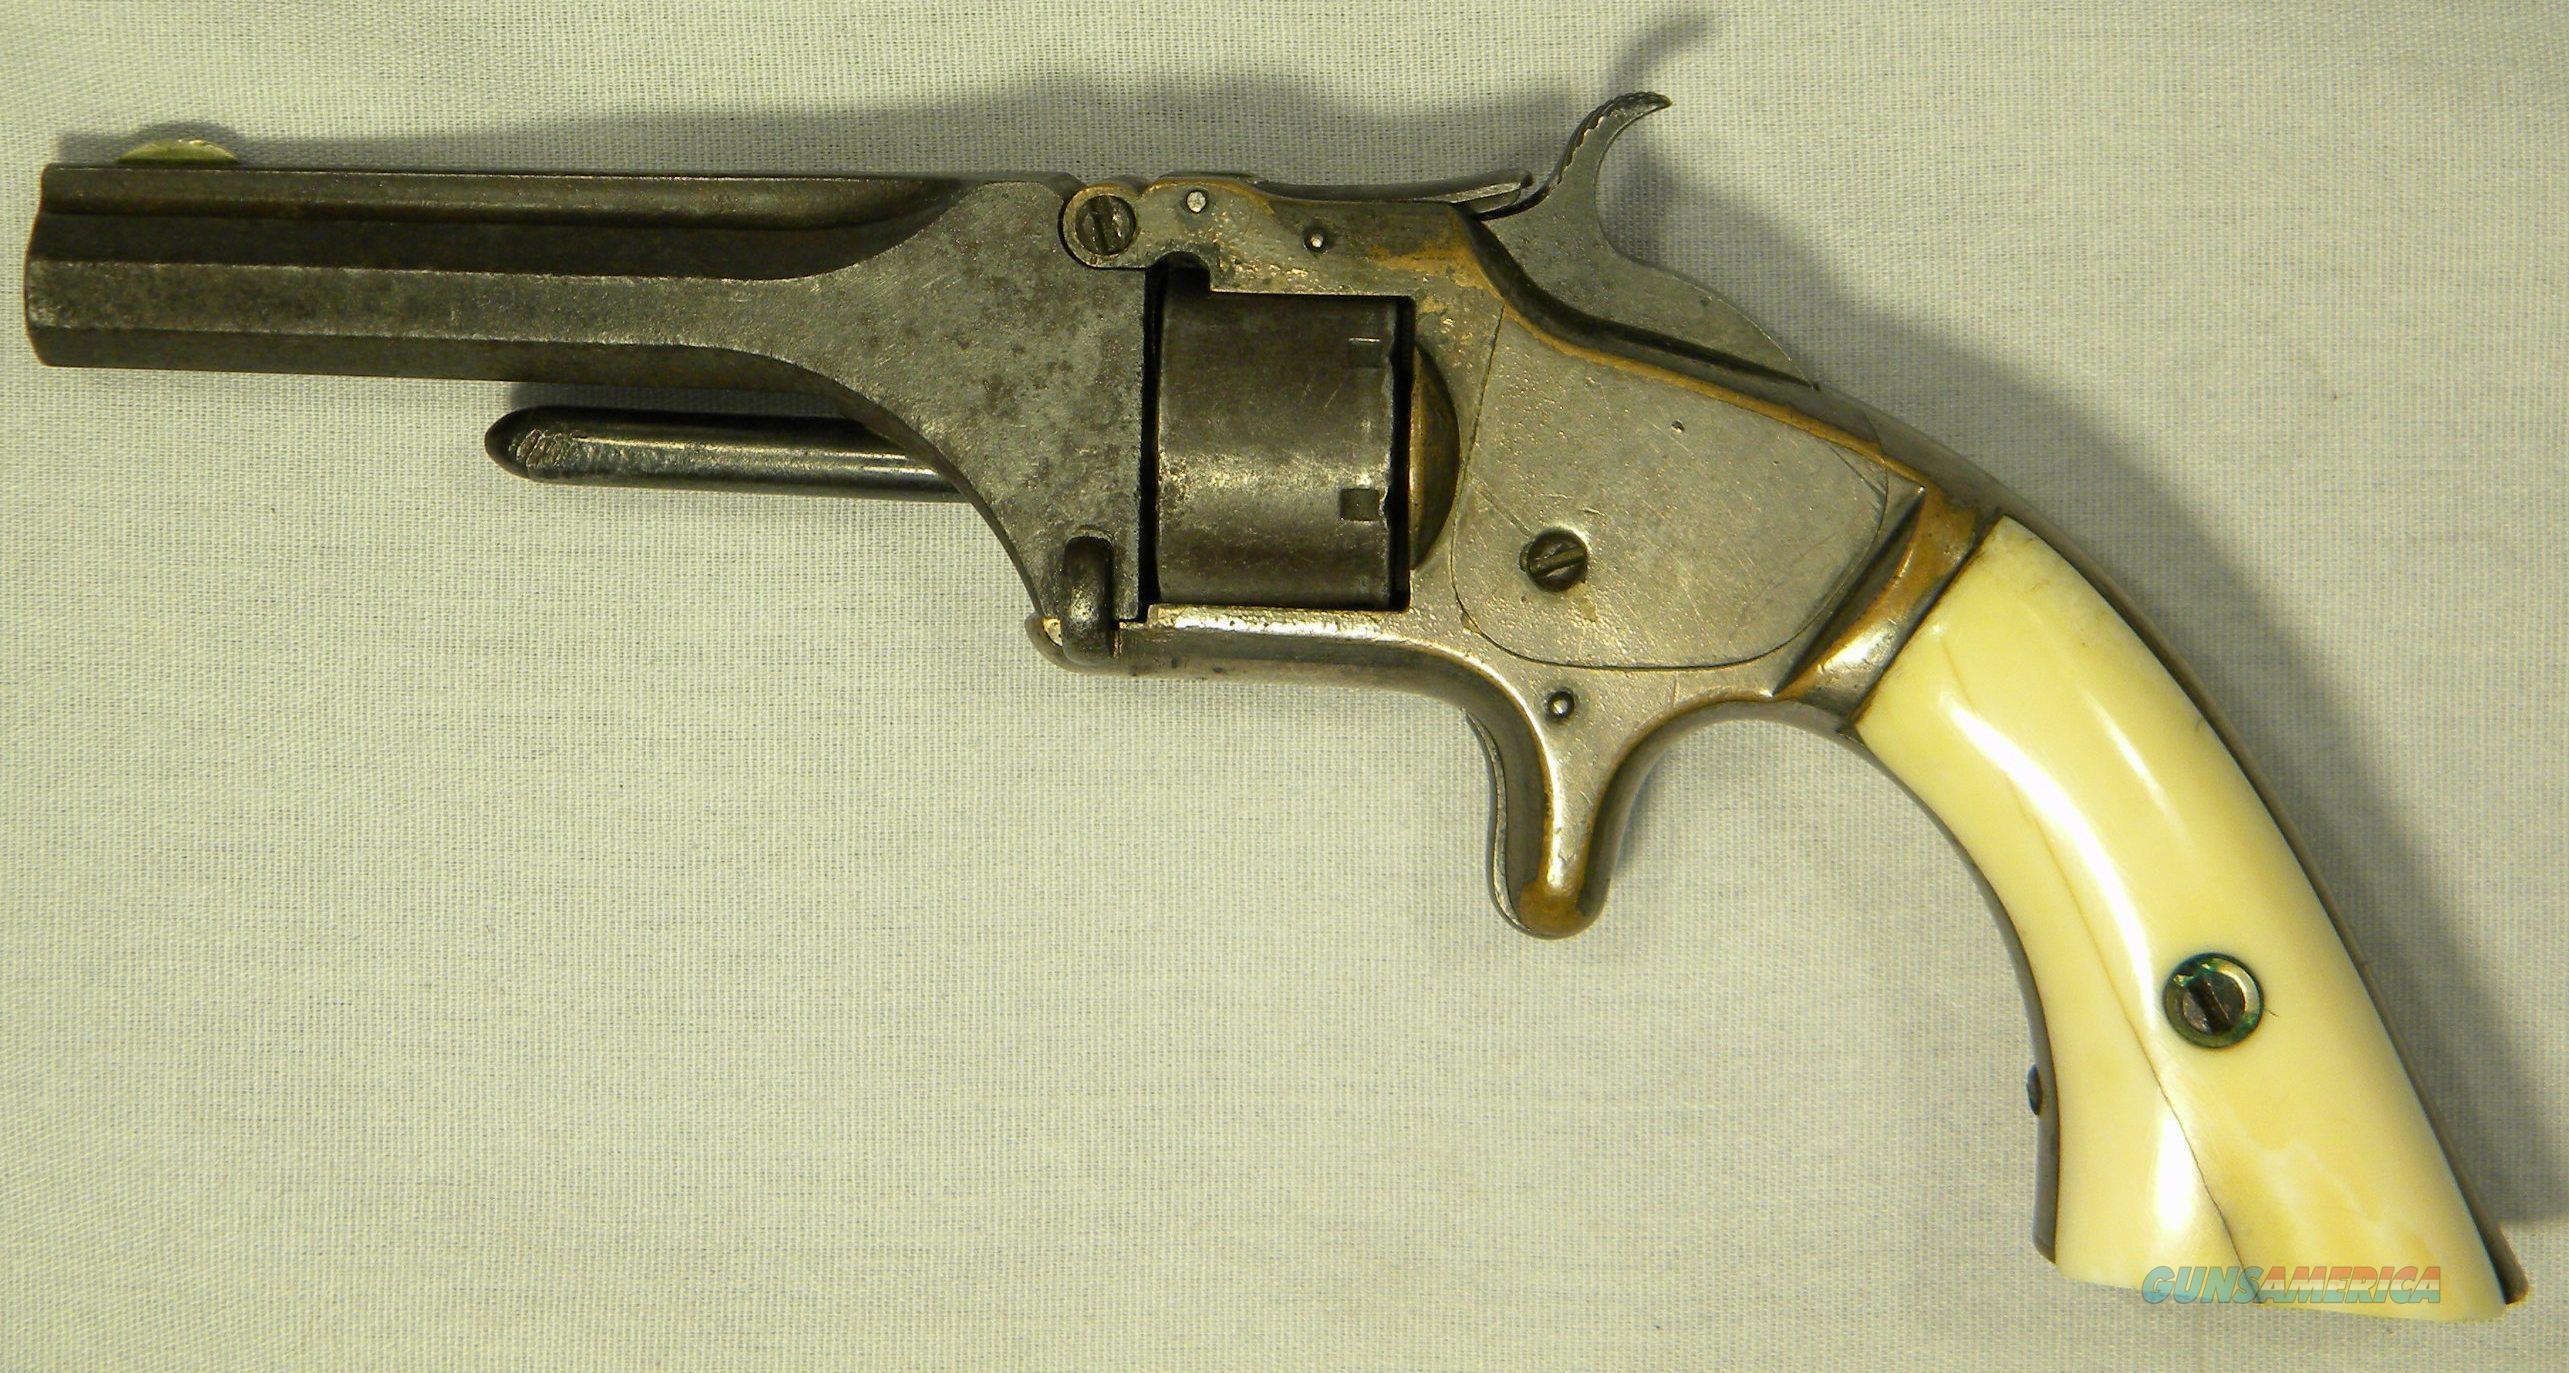 Smith & Wesson #1, 2nd Issue Revolver  Guns > Pistols > Smith & Wesson Revolvers > Pre-1945